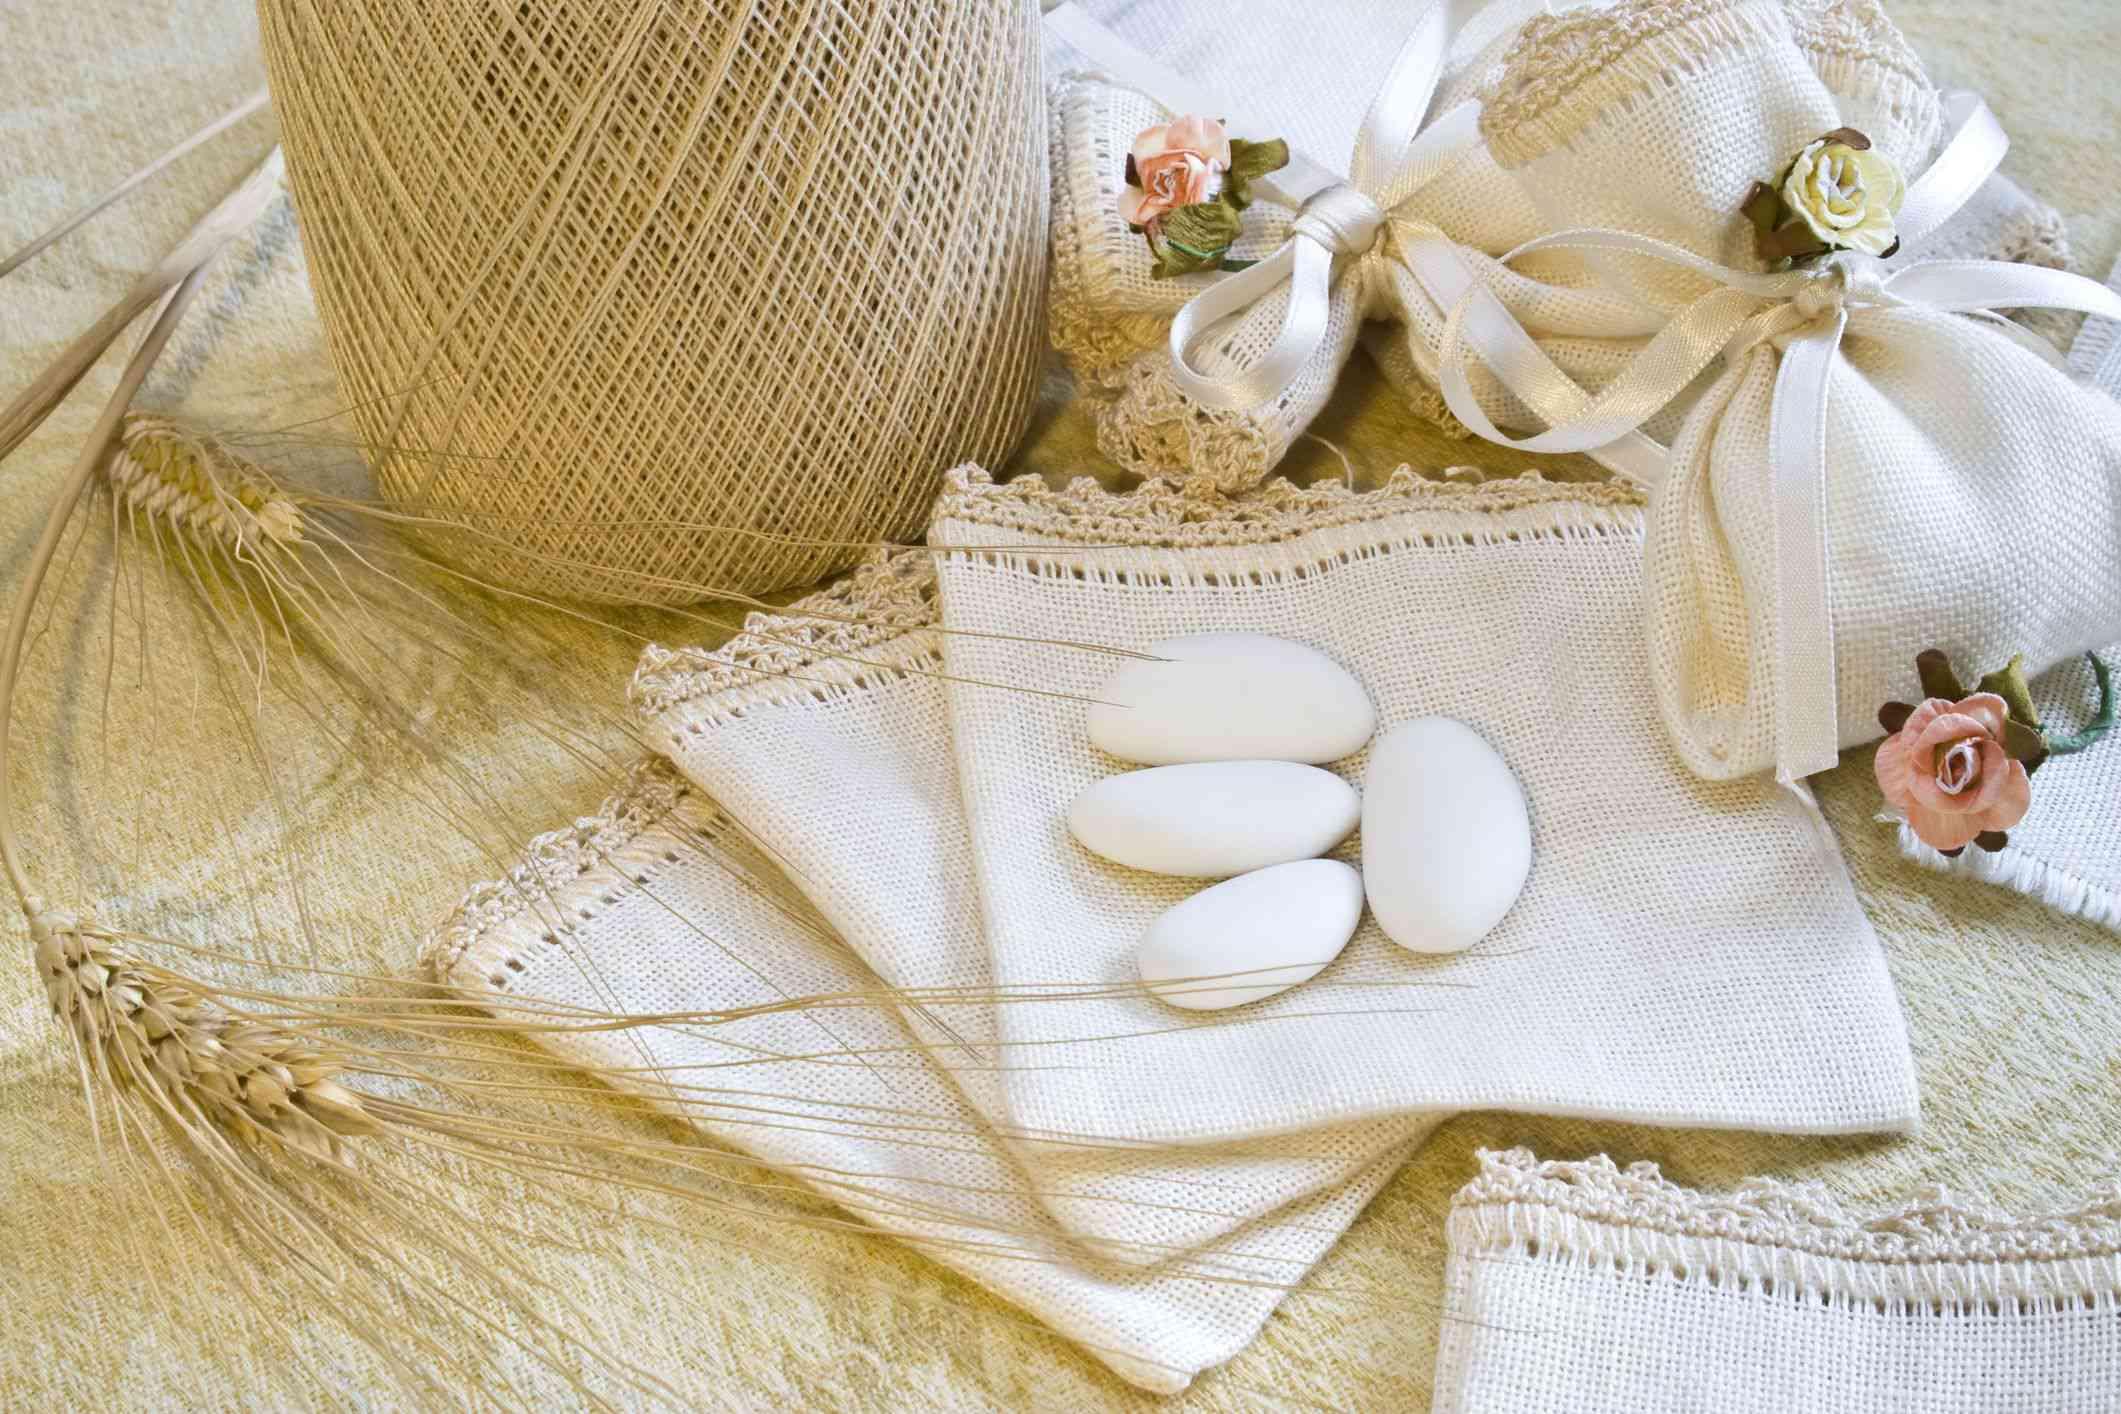 Sugared almond wedding favors